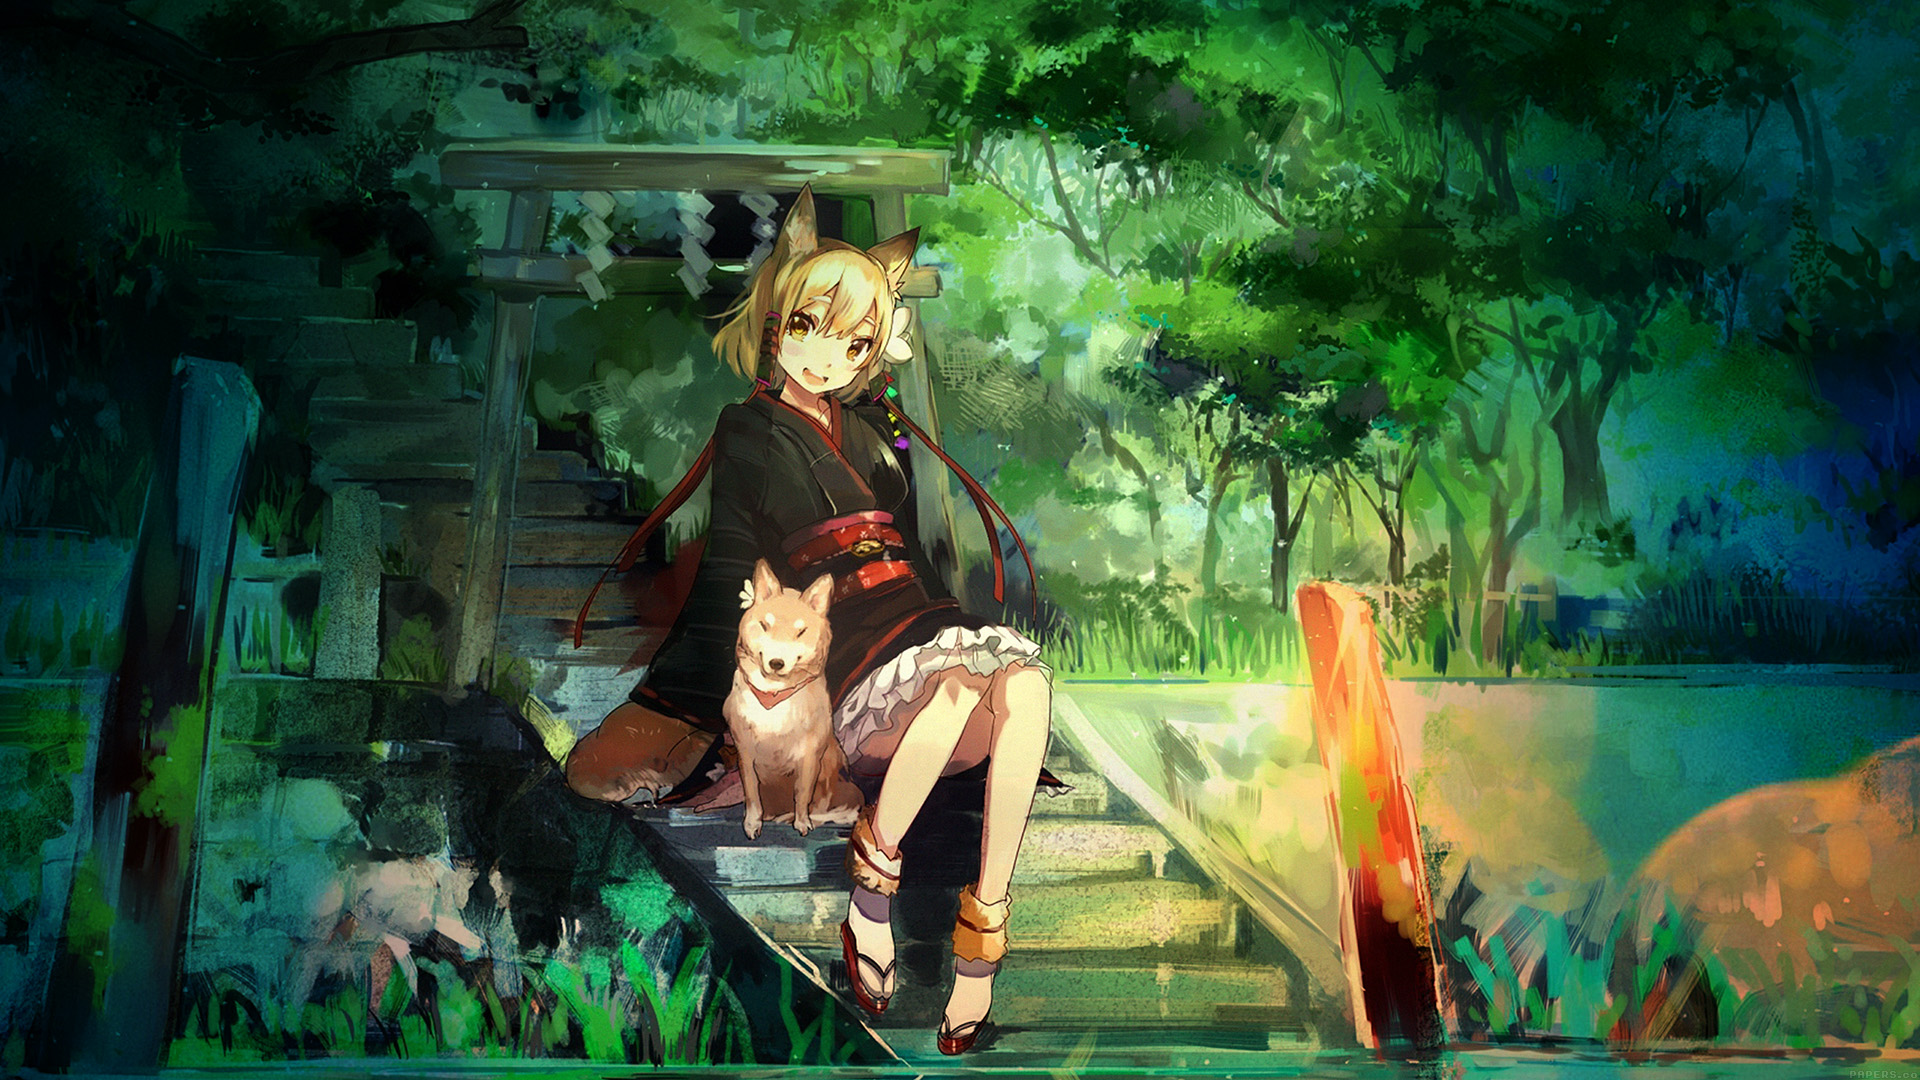 Anime Wallpaper Hd For Iphone: Aj47-girl-and-dog-green-nature-anime-art-illust